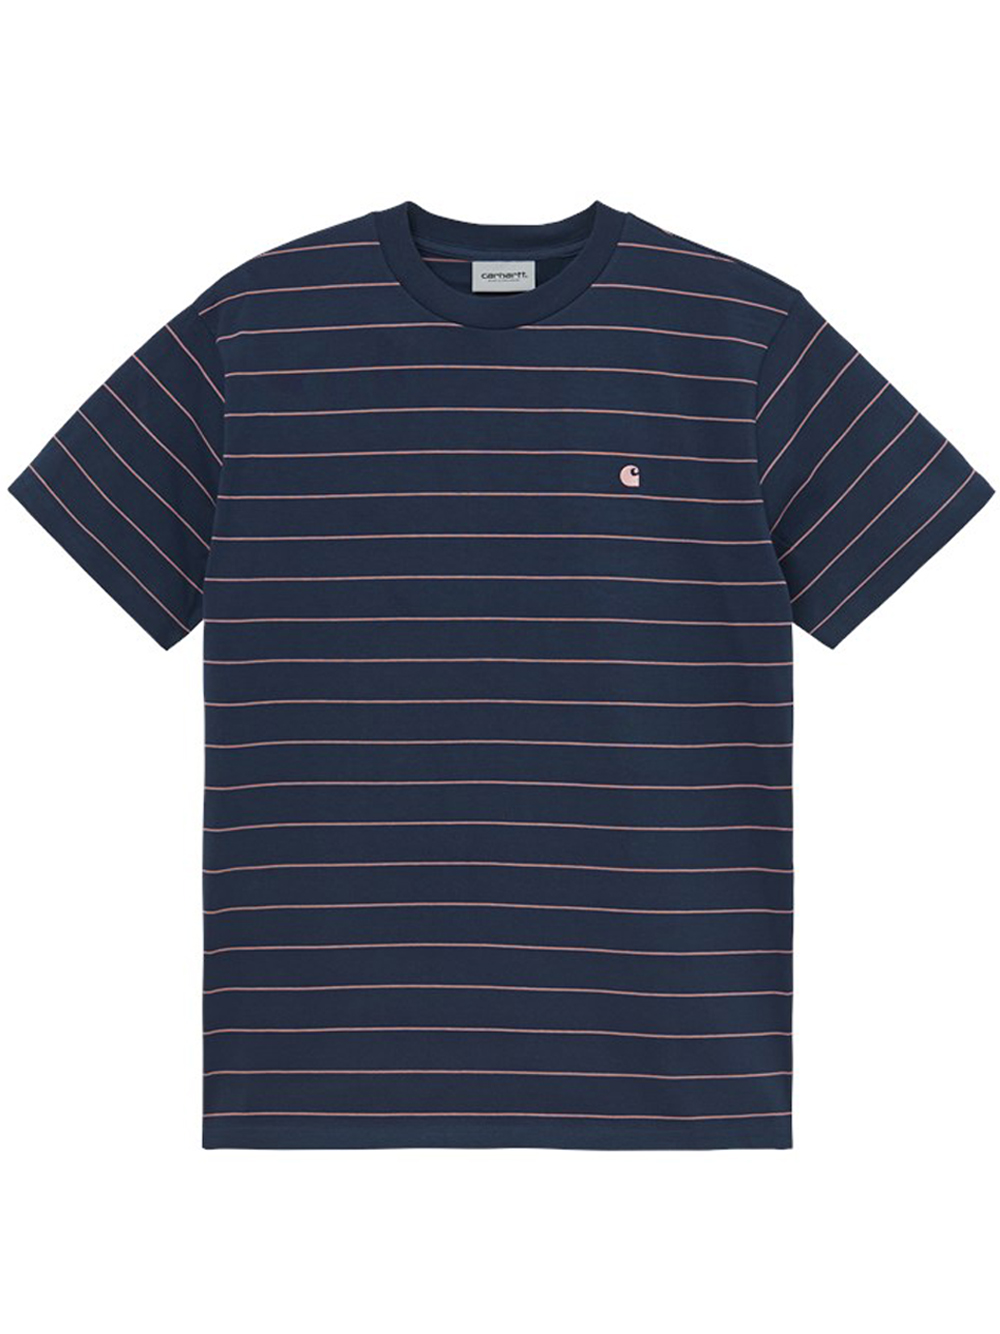 DENTON T-SHIRT CARHARTT WIP | T-shirts | I0289250AG.90